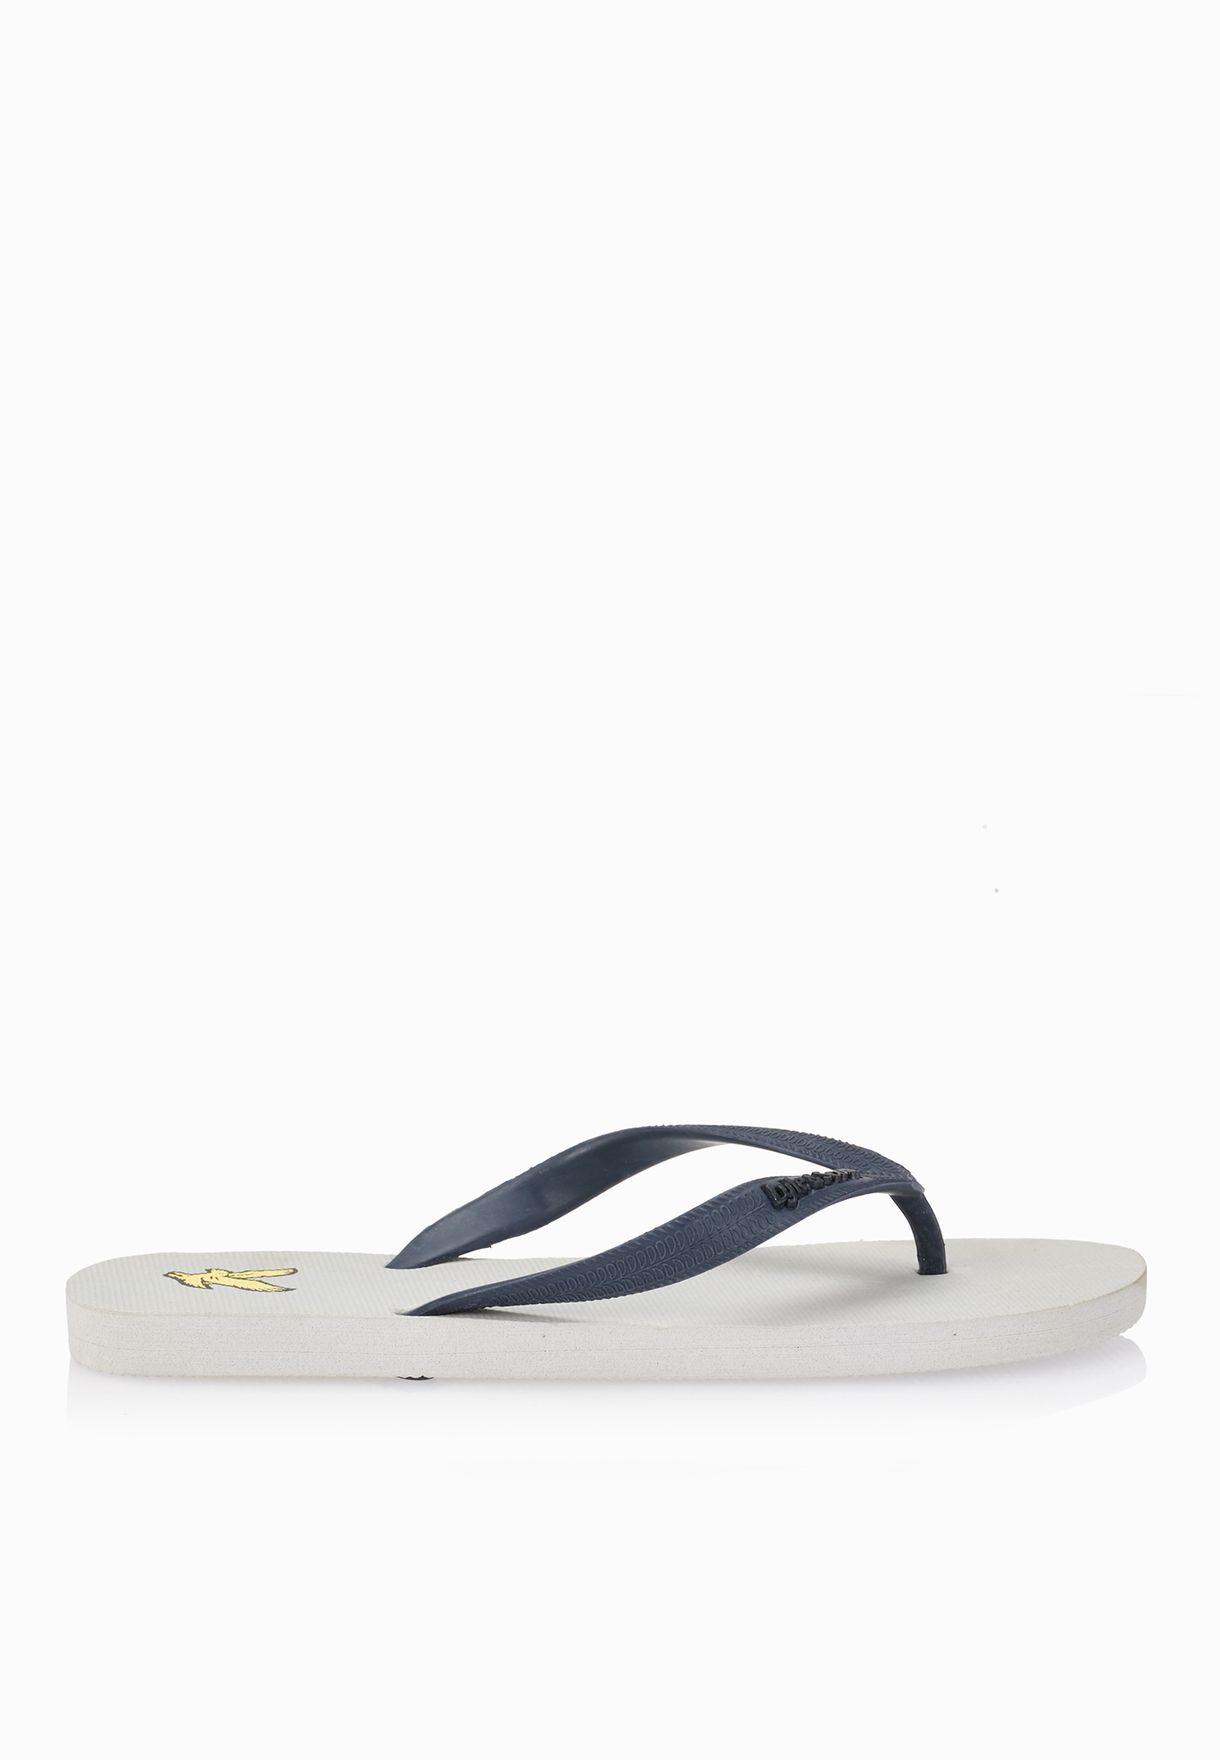 2541482ed84d15 Shop Lyle Scott grey Brora Flip Flops FW018V99 for Men in Qatar -  LY916SH44CMH